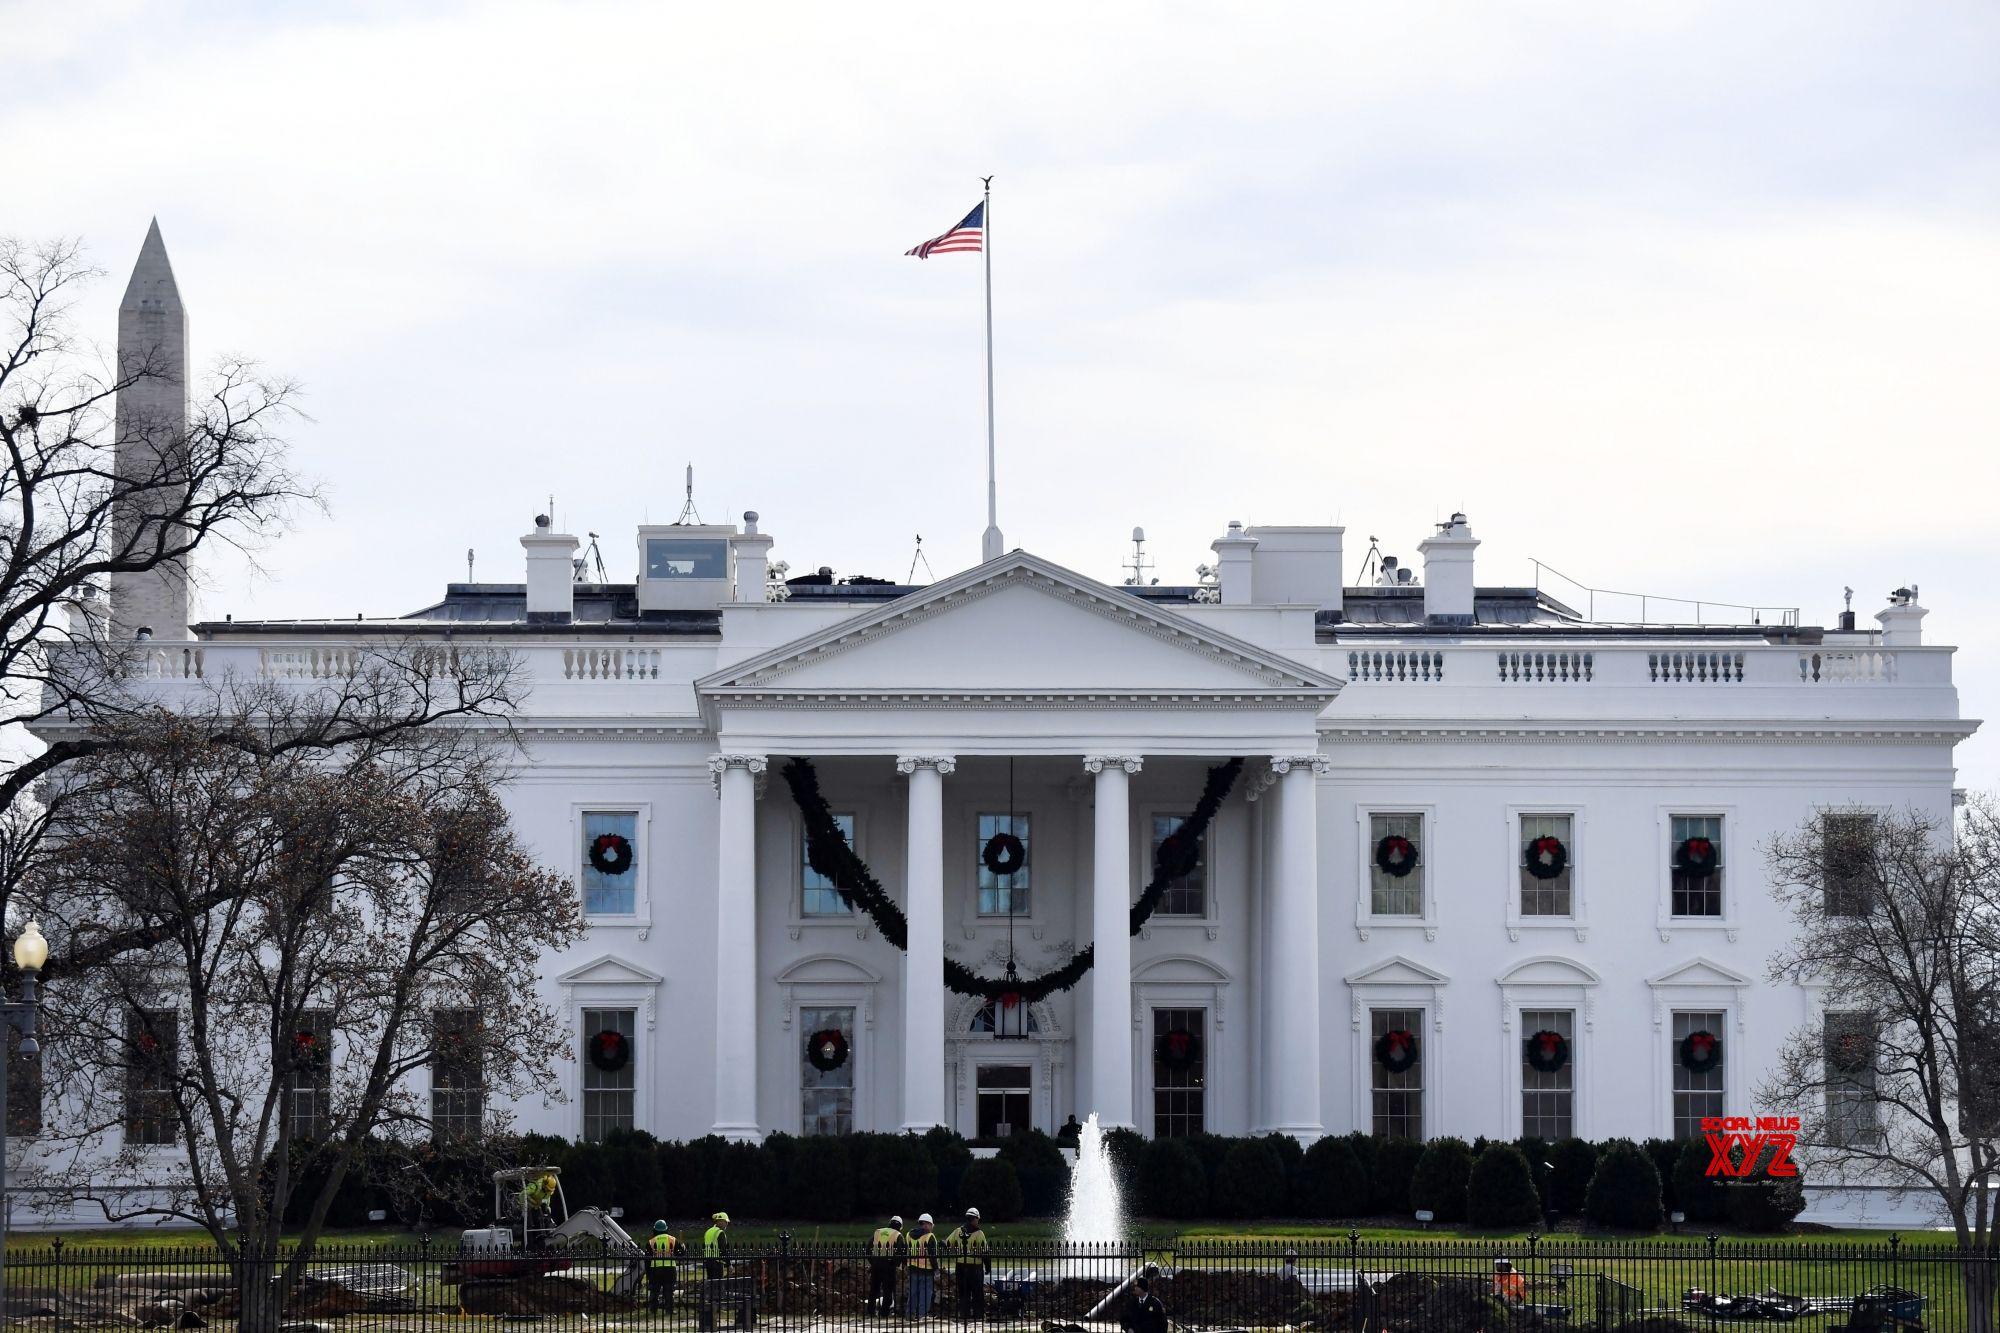 White Houses Iconic Magnolia Tree To Be Cut Down Social News Xyz